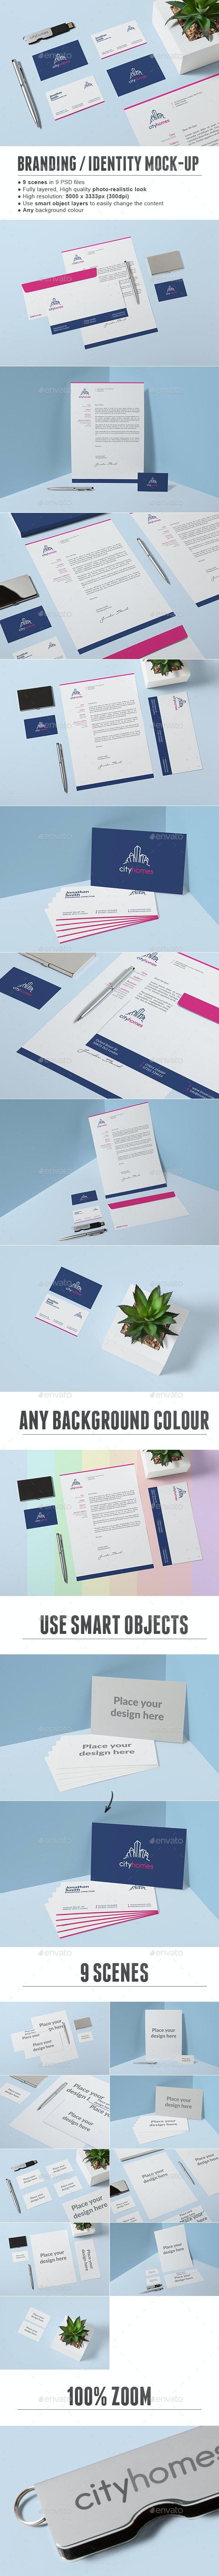 Branding / Identity Mock-up - Print Product Mock-Ups